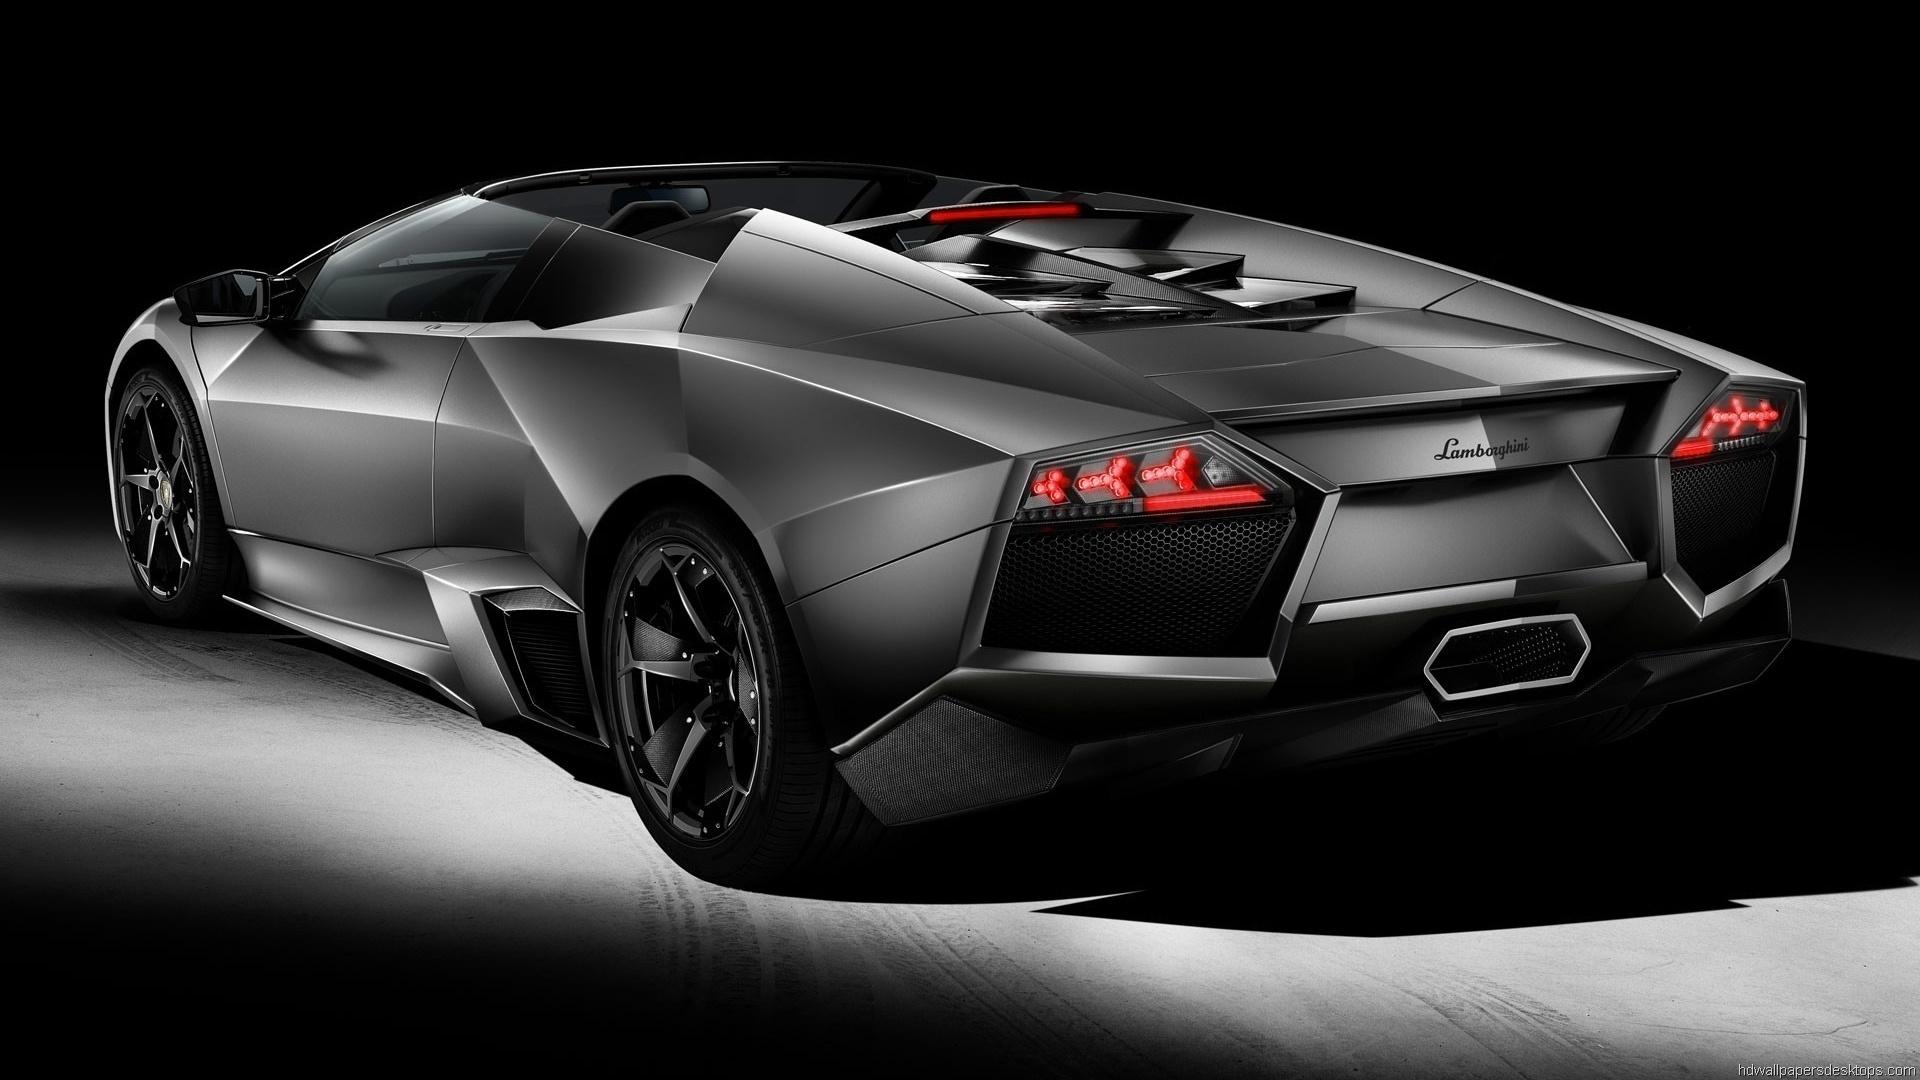 Cars Wallpapers HD Full HD 1080p Desktop Backgrounds 1920x1080 1920x1080